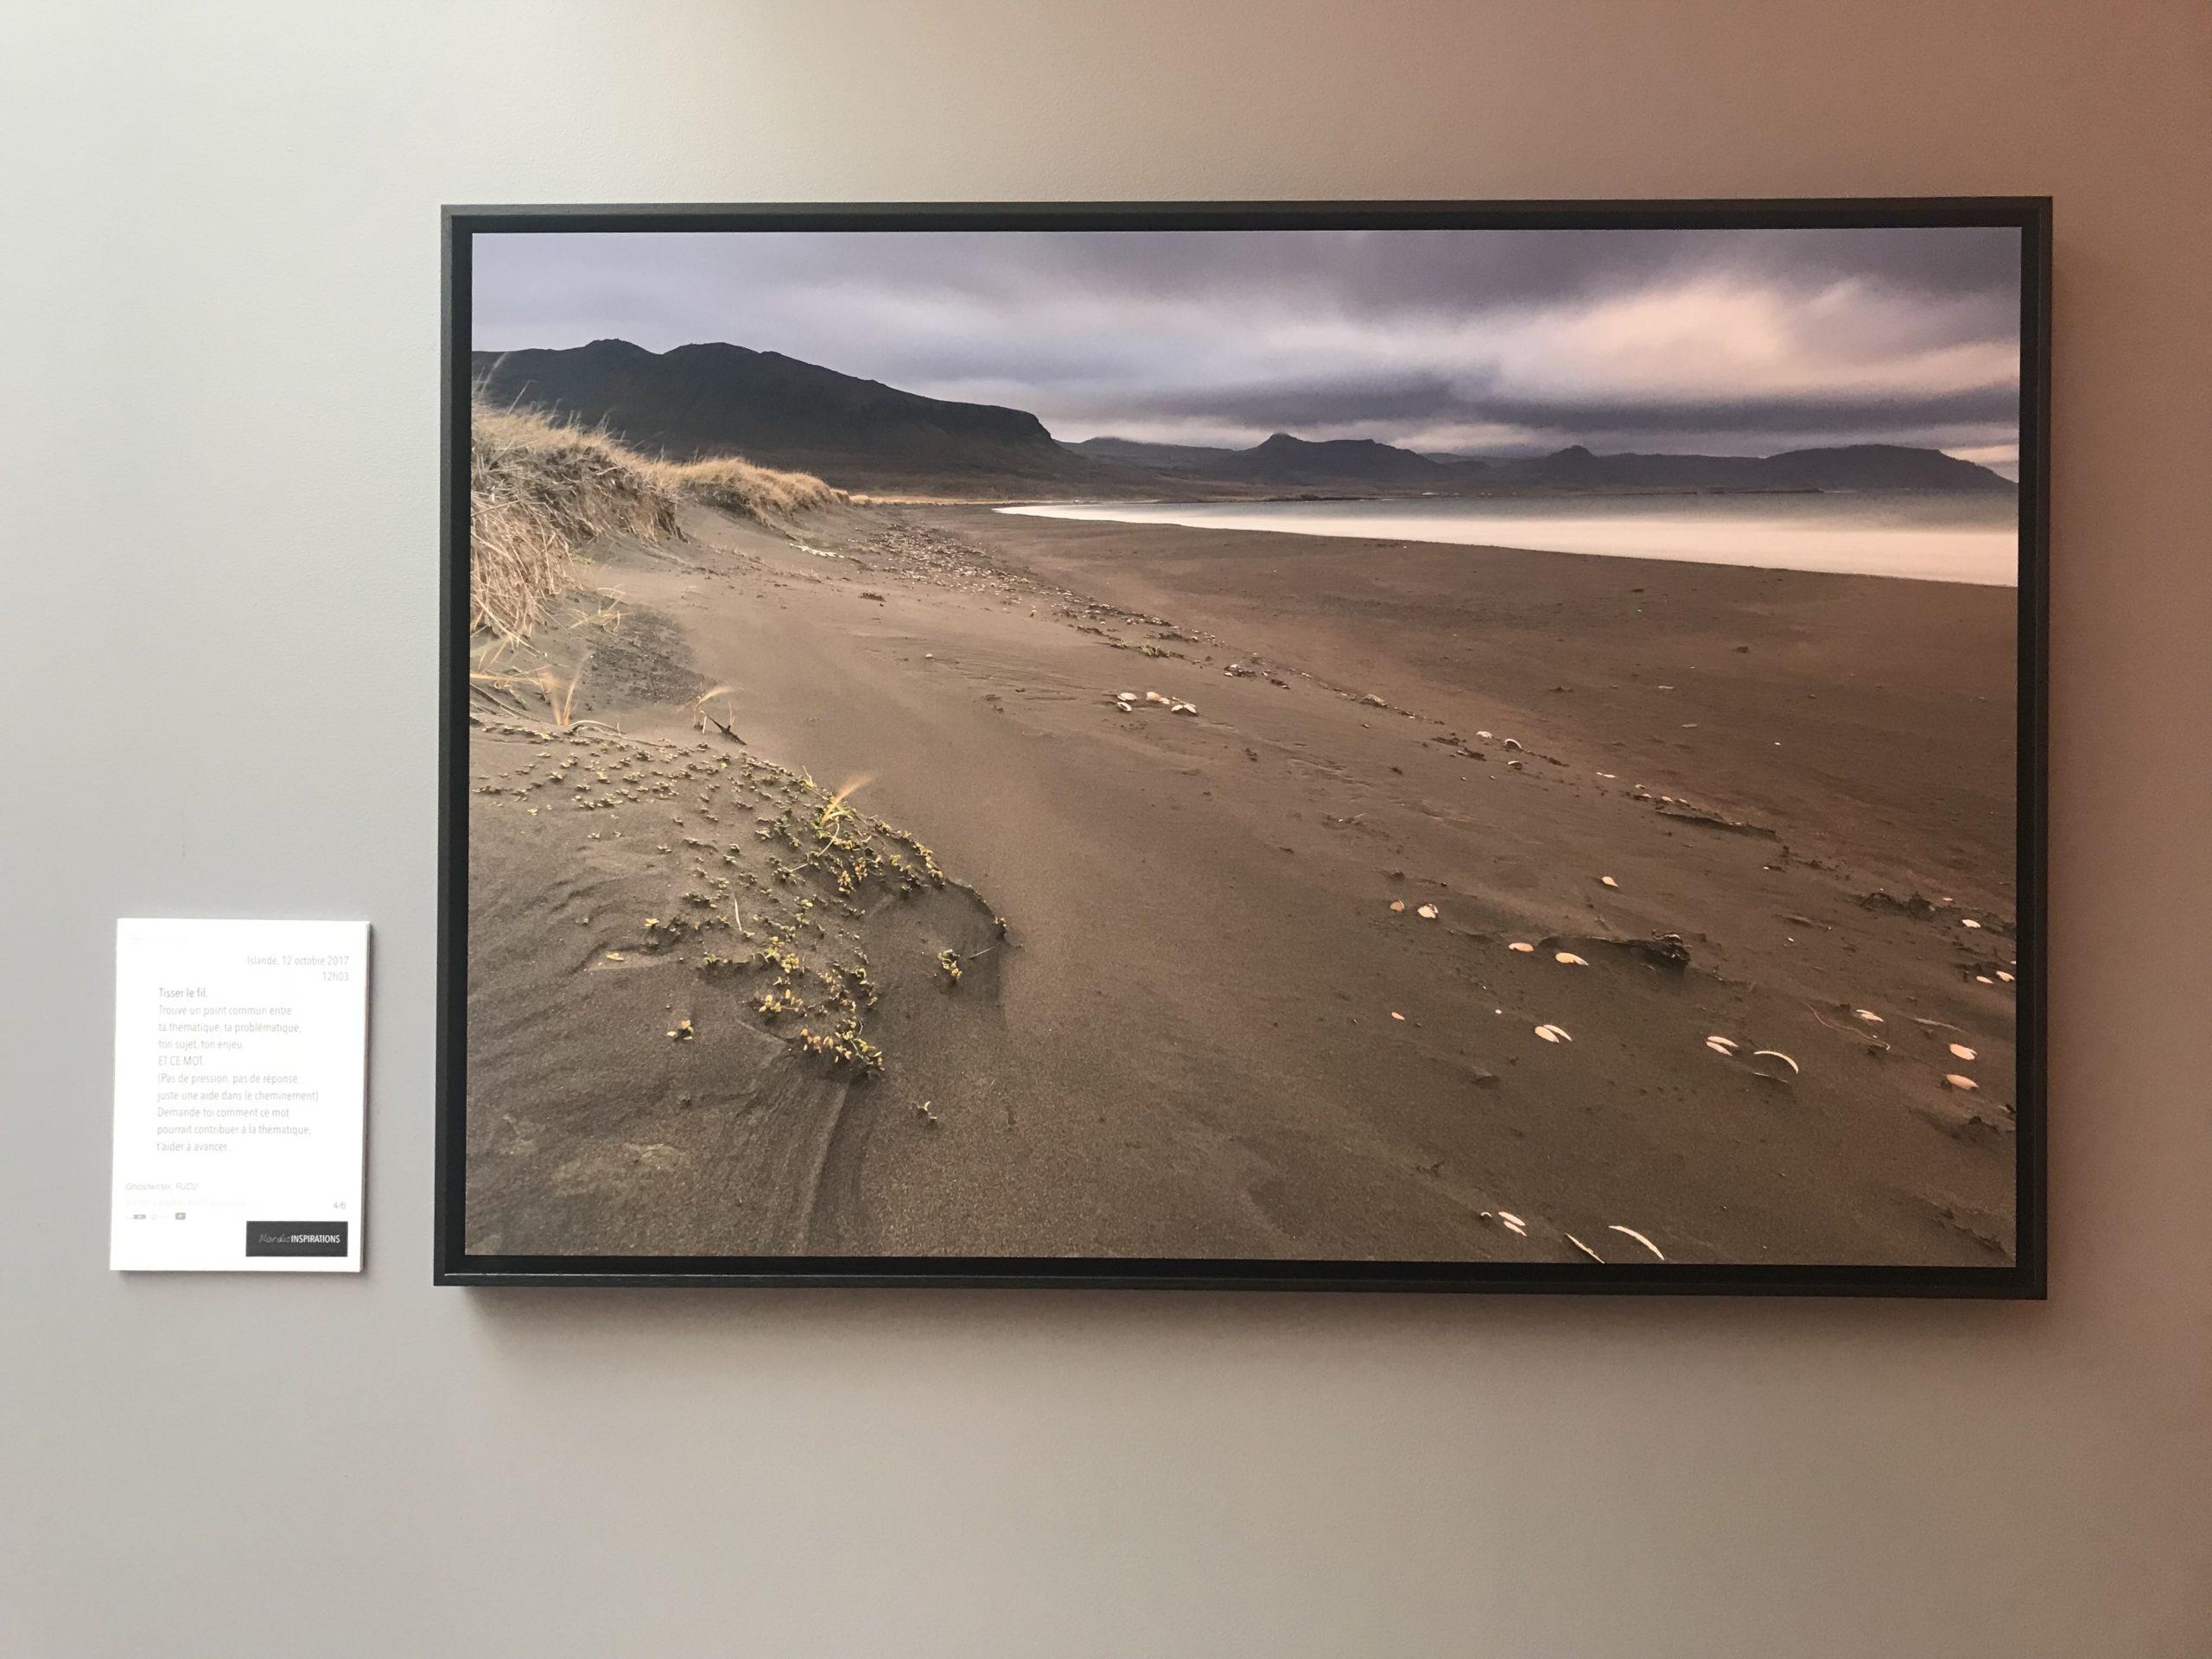 Tirage d'art - Mickaël Bonnami Photographe - Nordic Inspirations